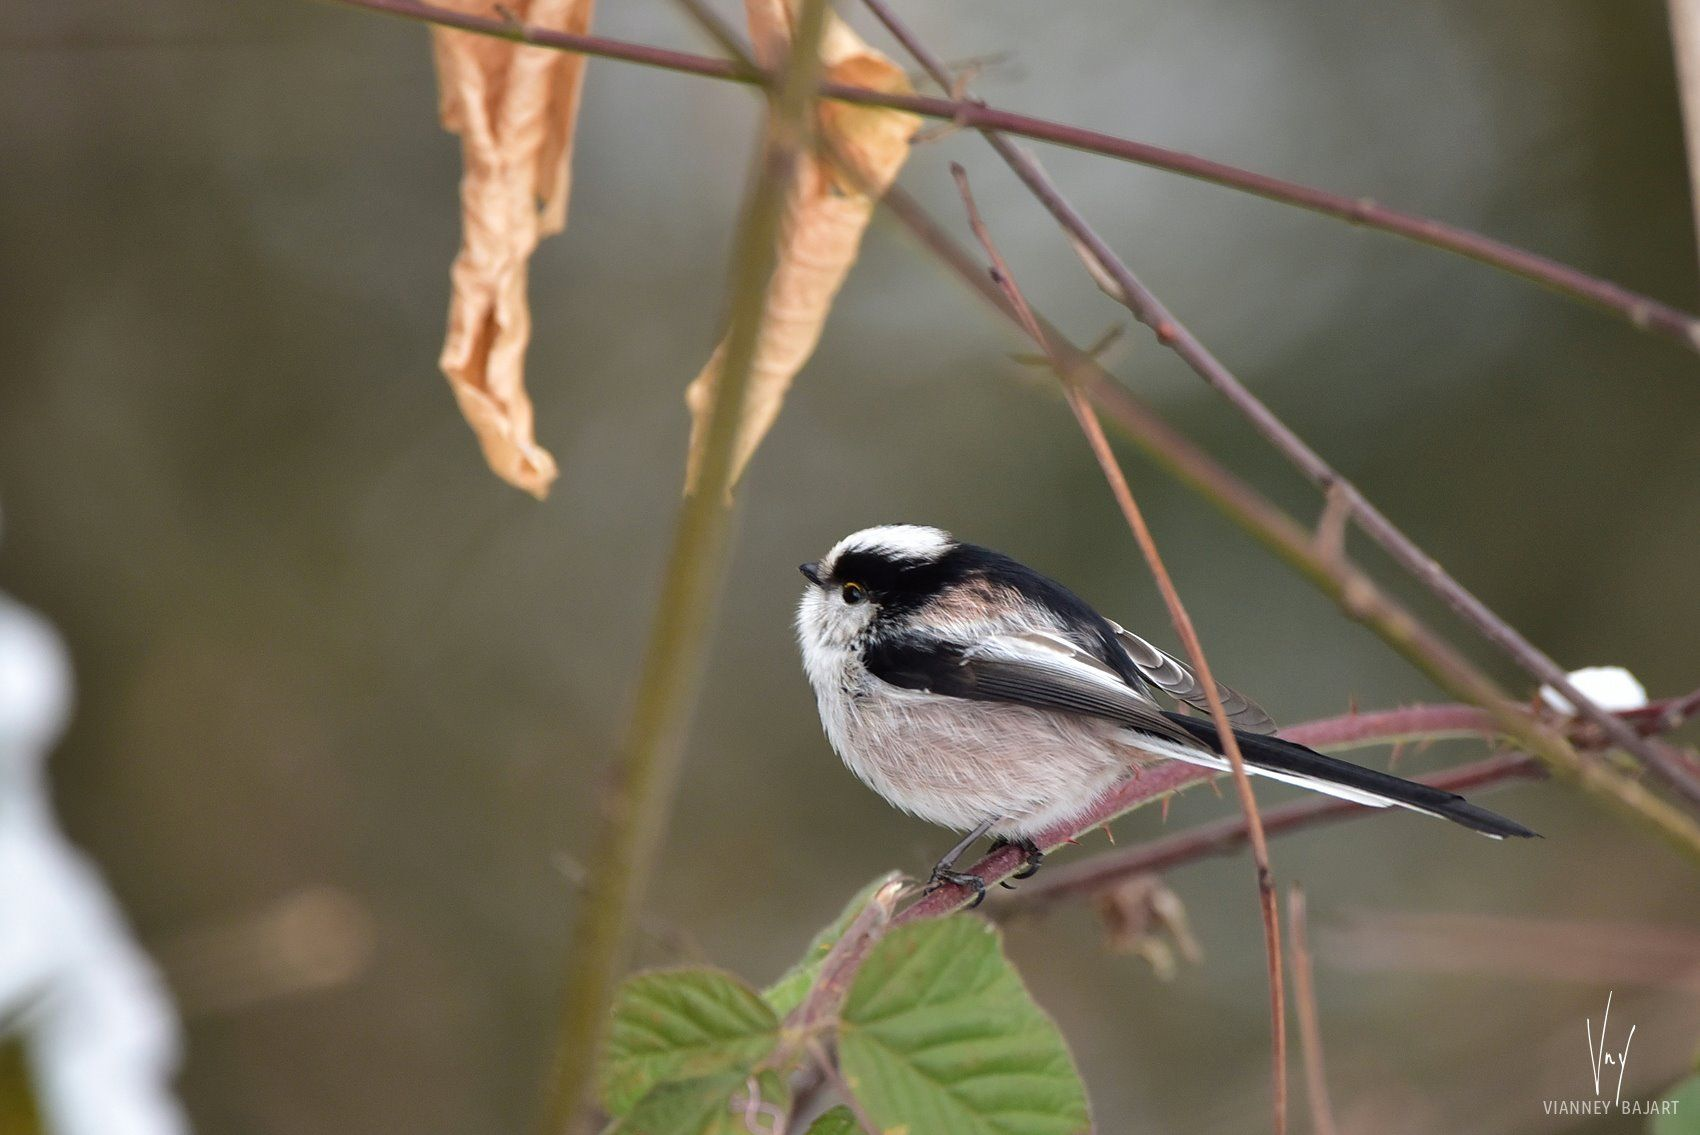 Pin by Audrey K. on Fauna Bird feeders, Outdoor decor